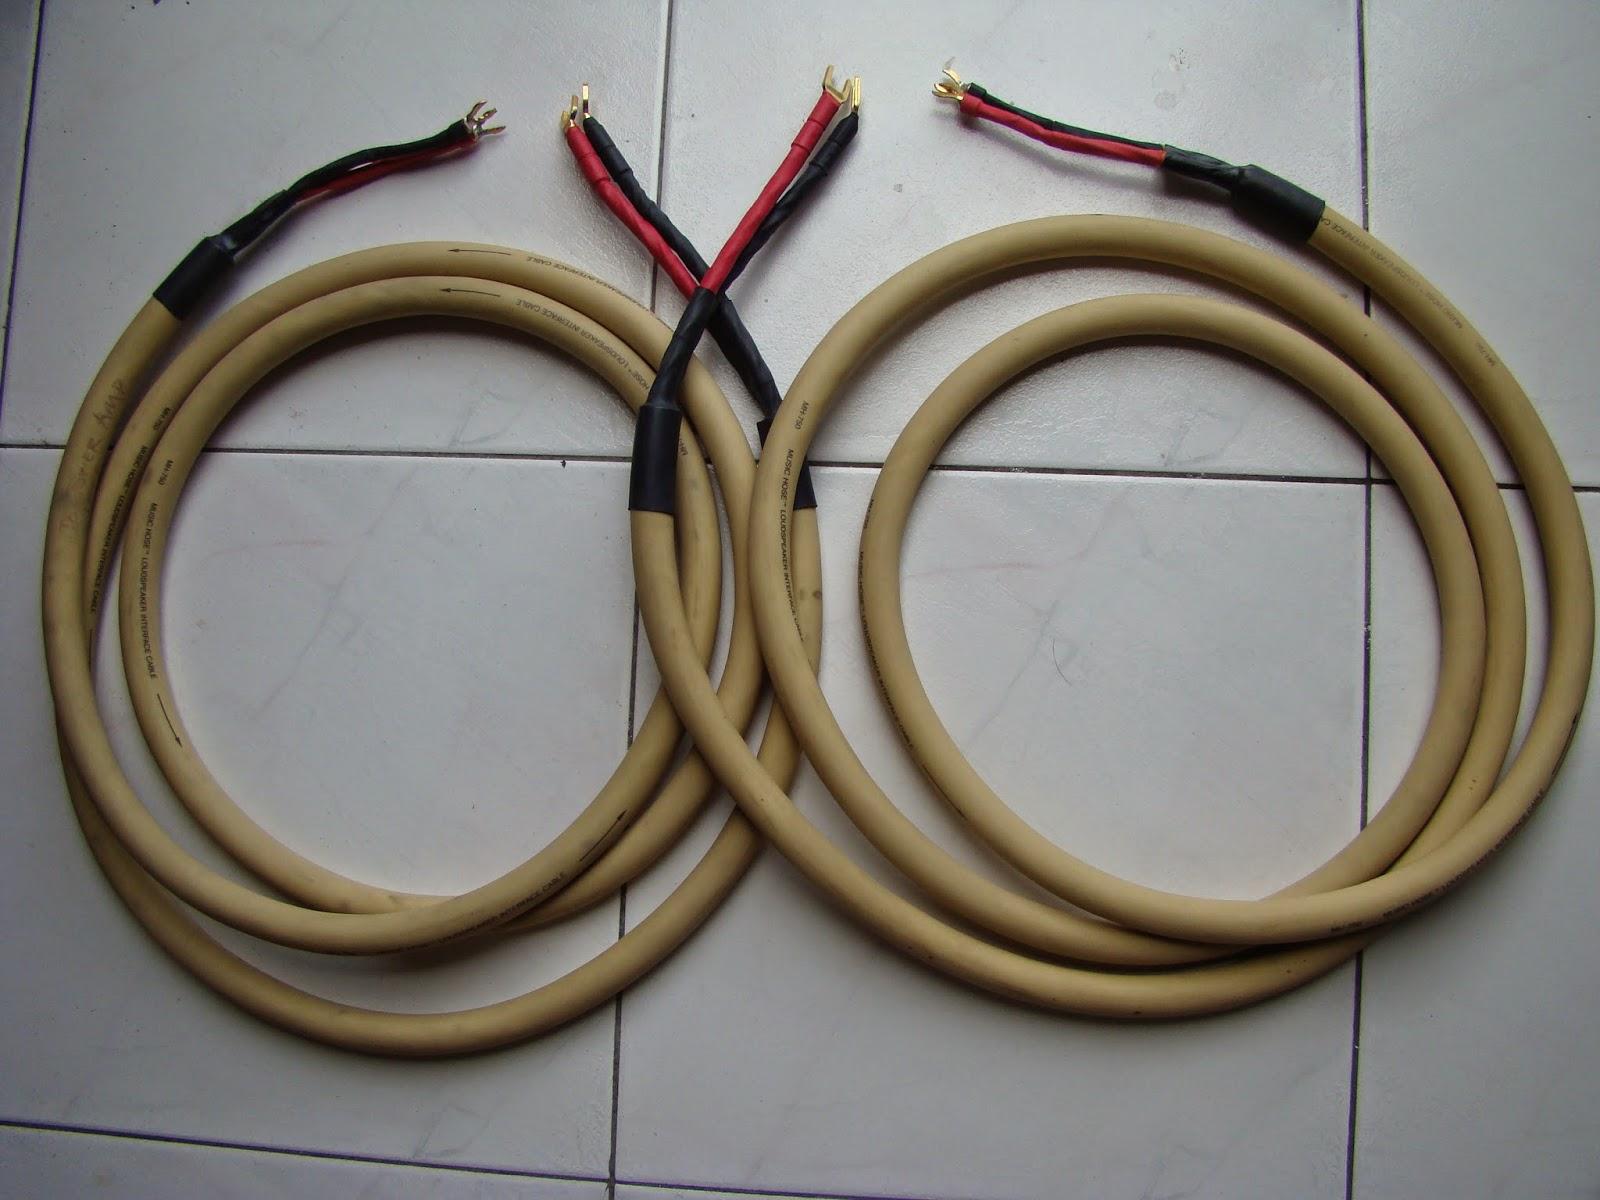 kinta valley audio mit mh 750 music hose speaker cables sold. Black Bedroom Furniture Sets. Home Design Ideas